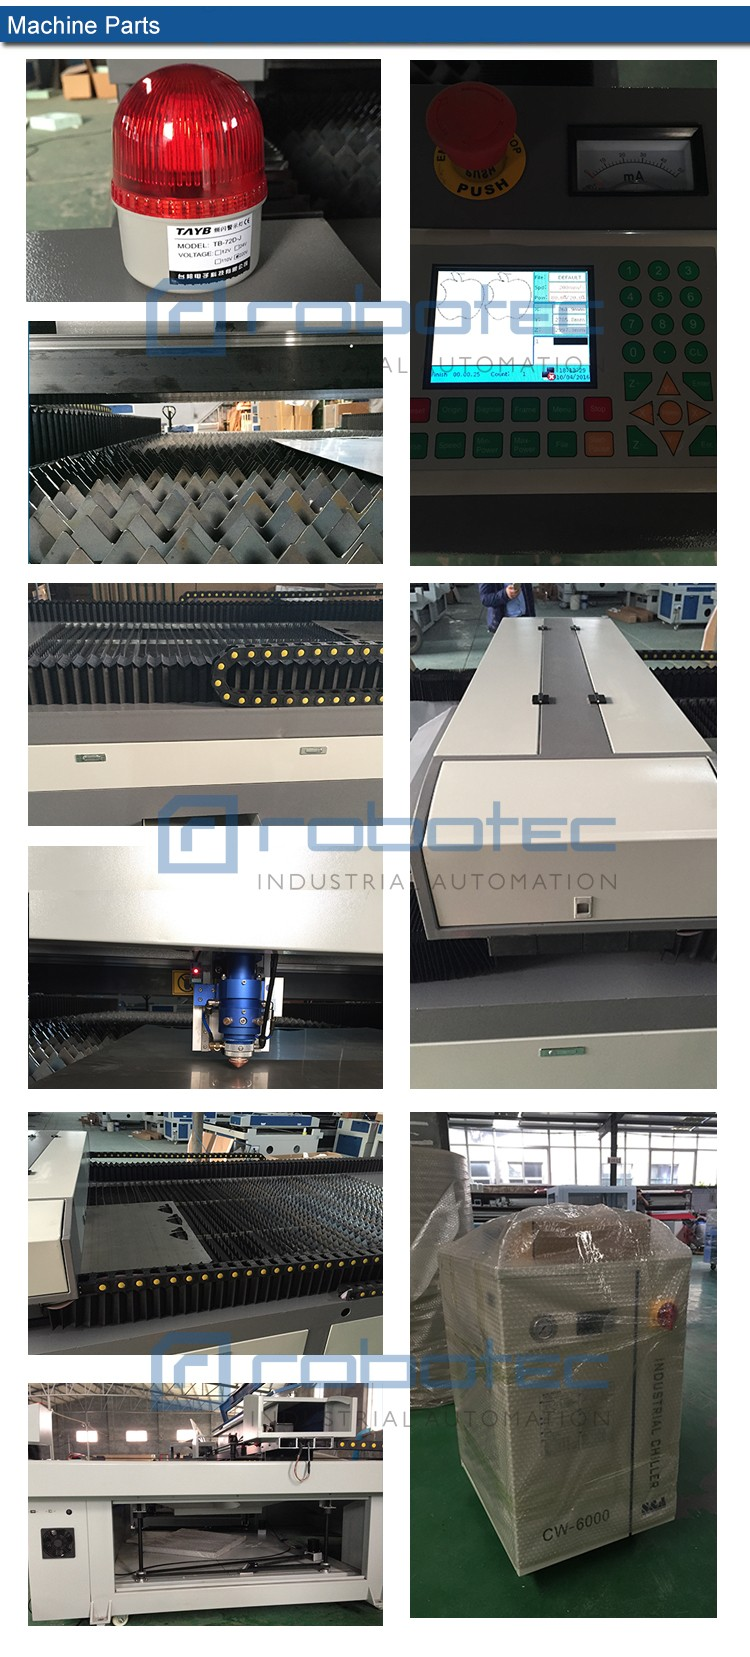 HTB1 0JYOFXXXXaGXFXXq6xXFXXXN - Heavy body RECI Steel laser cutter 4x8 feet CO2 wood laser cutting machine 150W laser engraver for sale for small business